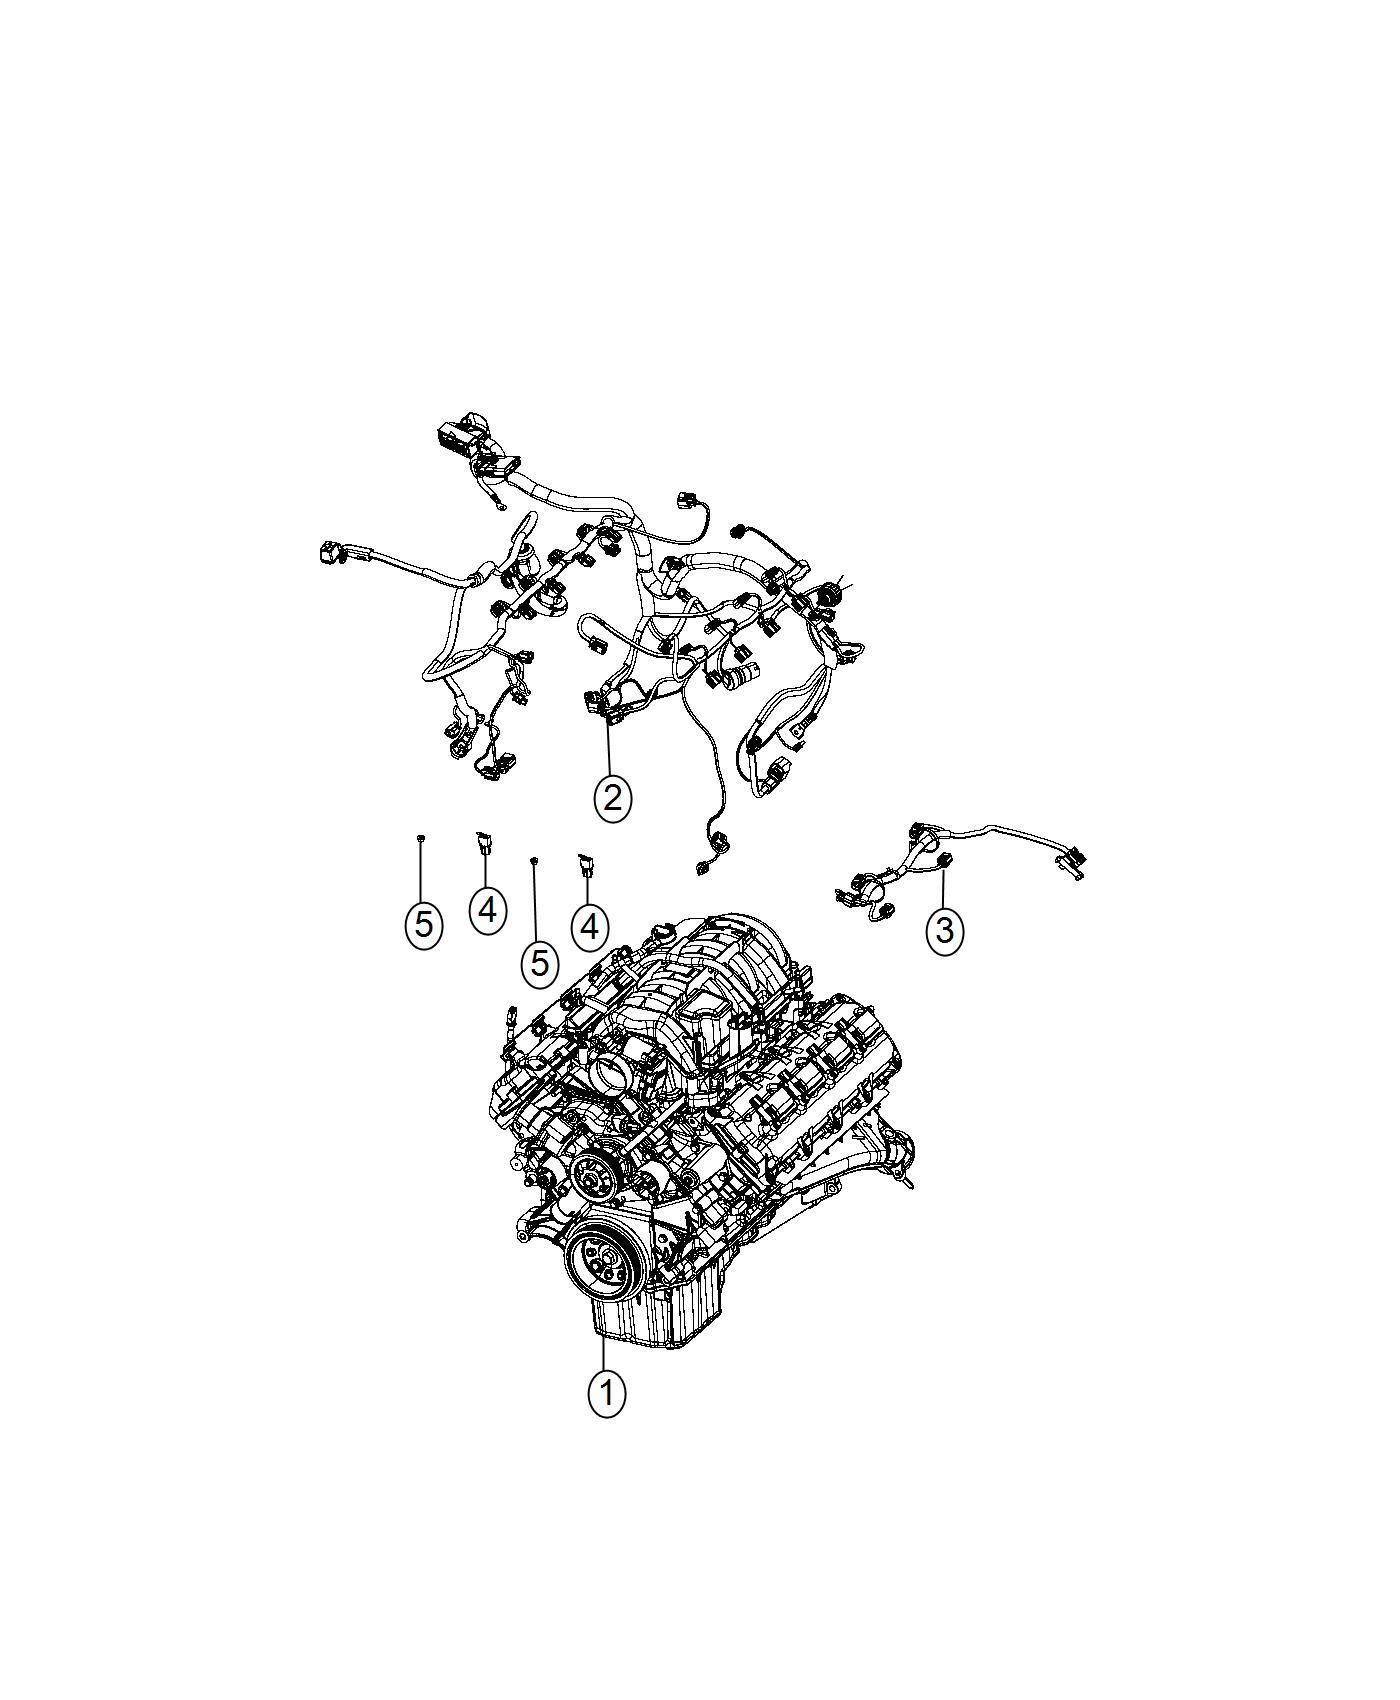 2017 dodge charger wiring  engine  powertrain  oil  mopar  electrical  cooler